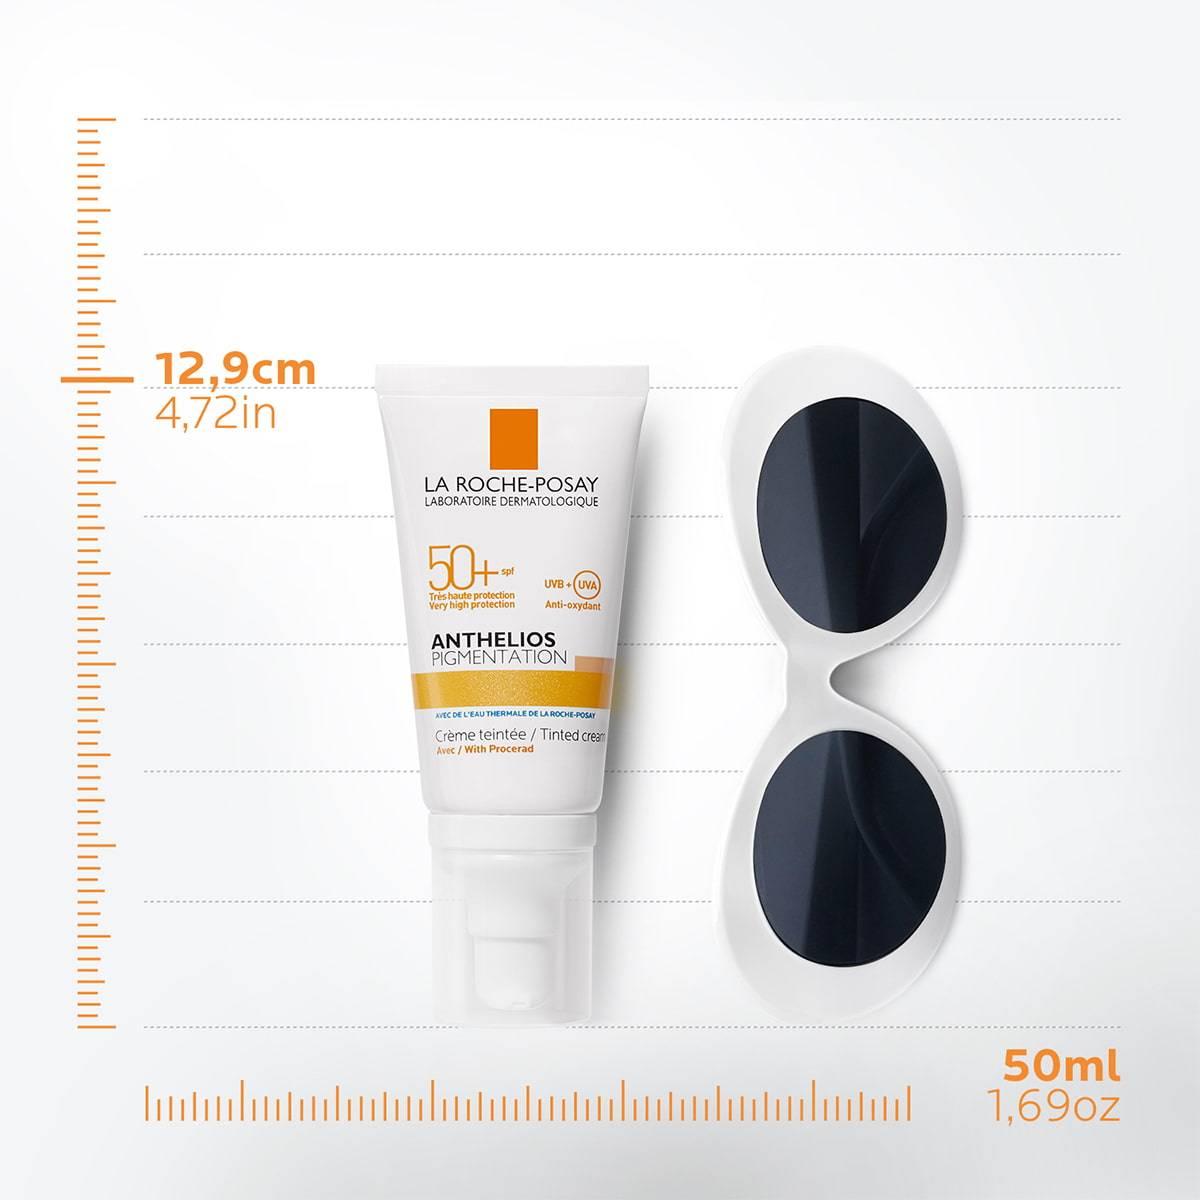 La Roche Posay ProduktSide Sol Anthelios Pigmentation Tinted Cream Spf